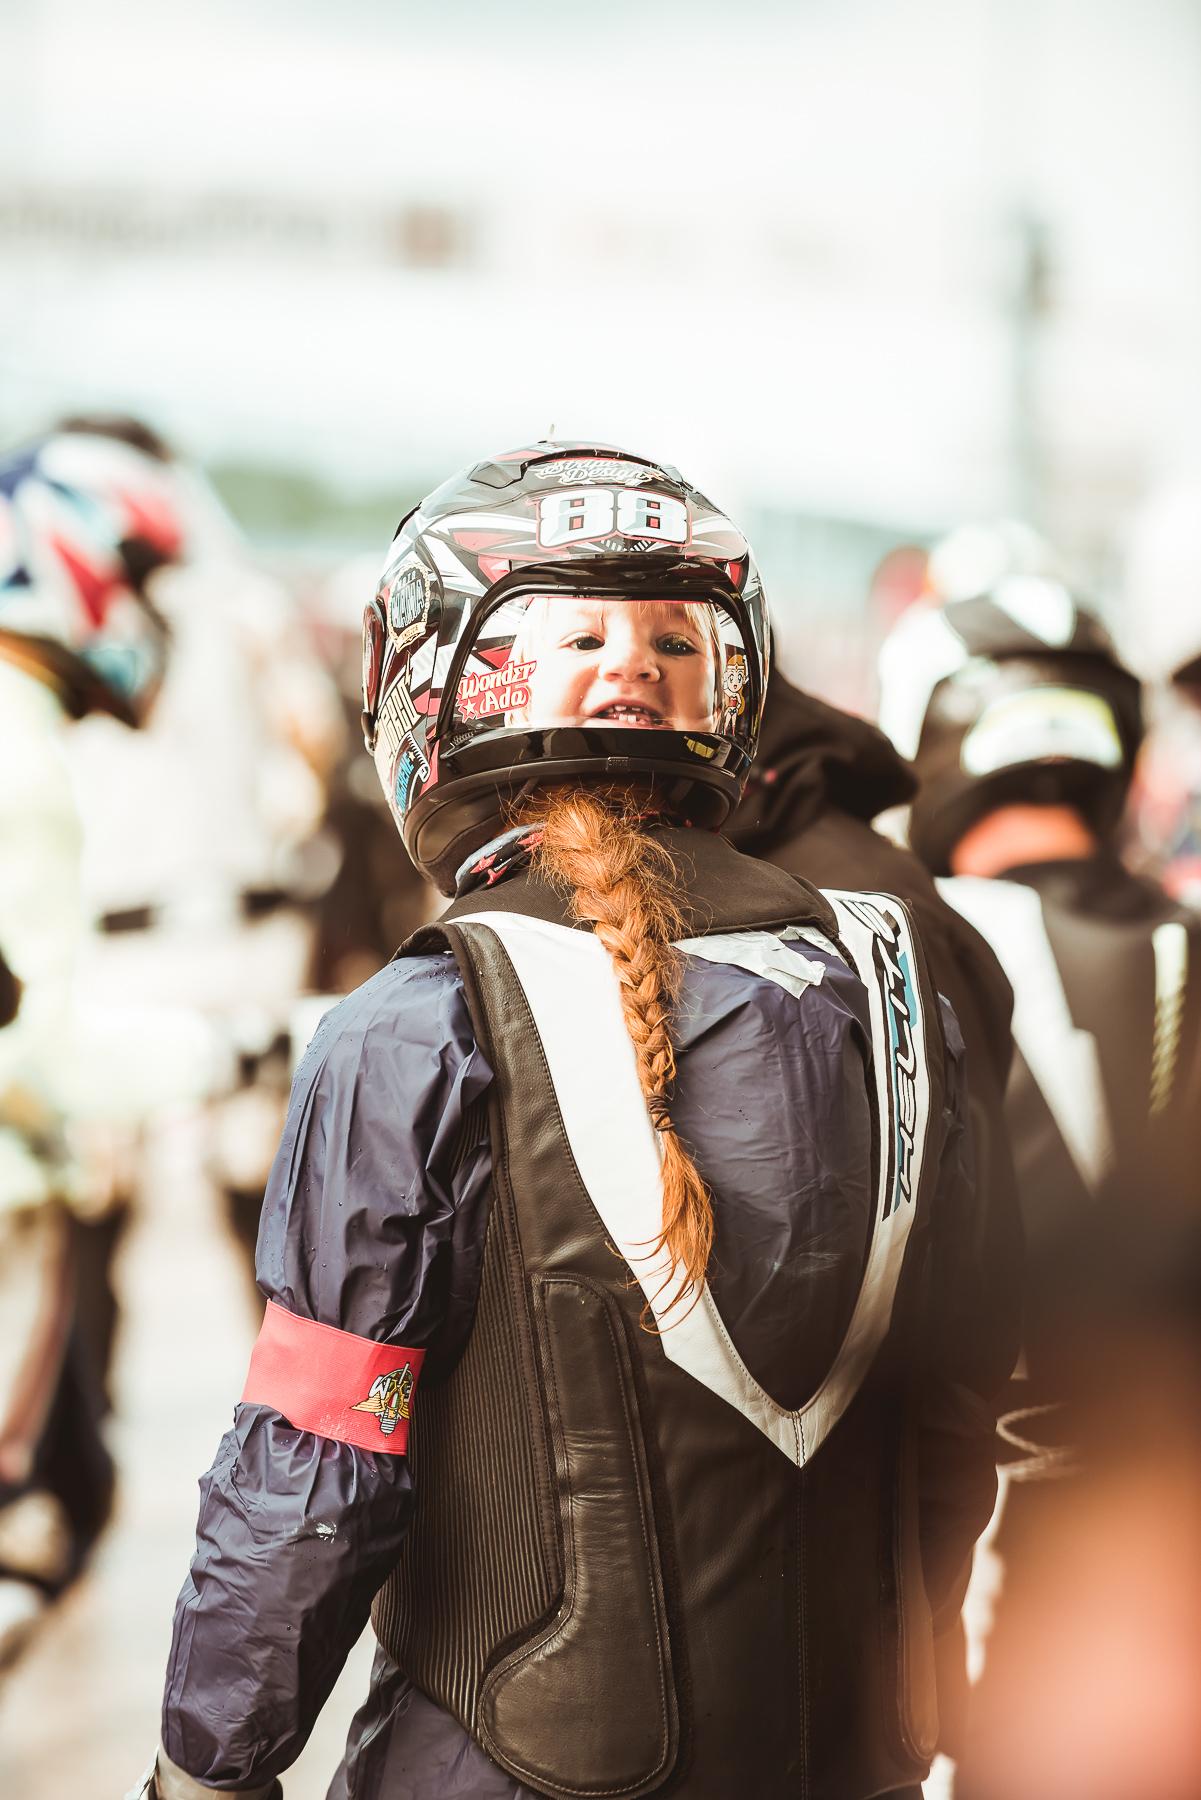 2020-Moto-Guzzi-Endurance-DAY-3-RAIN-17